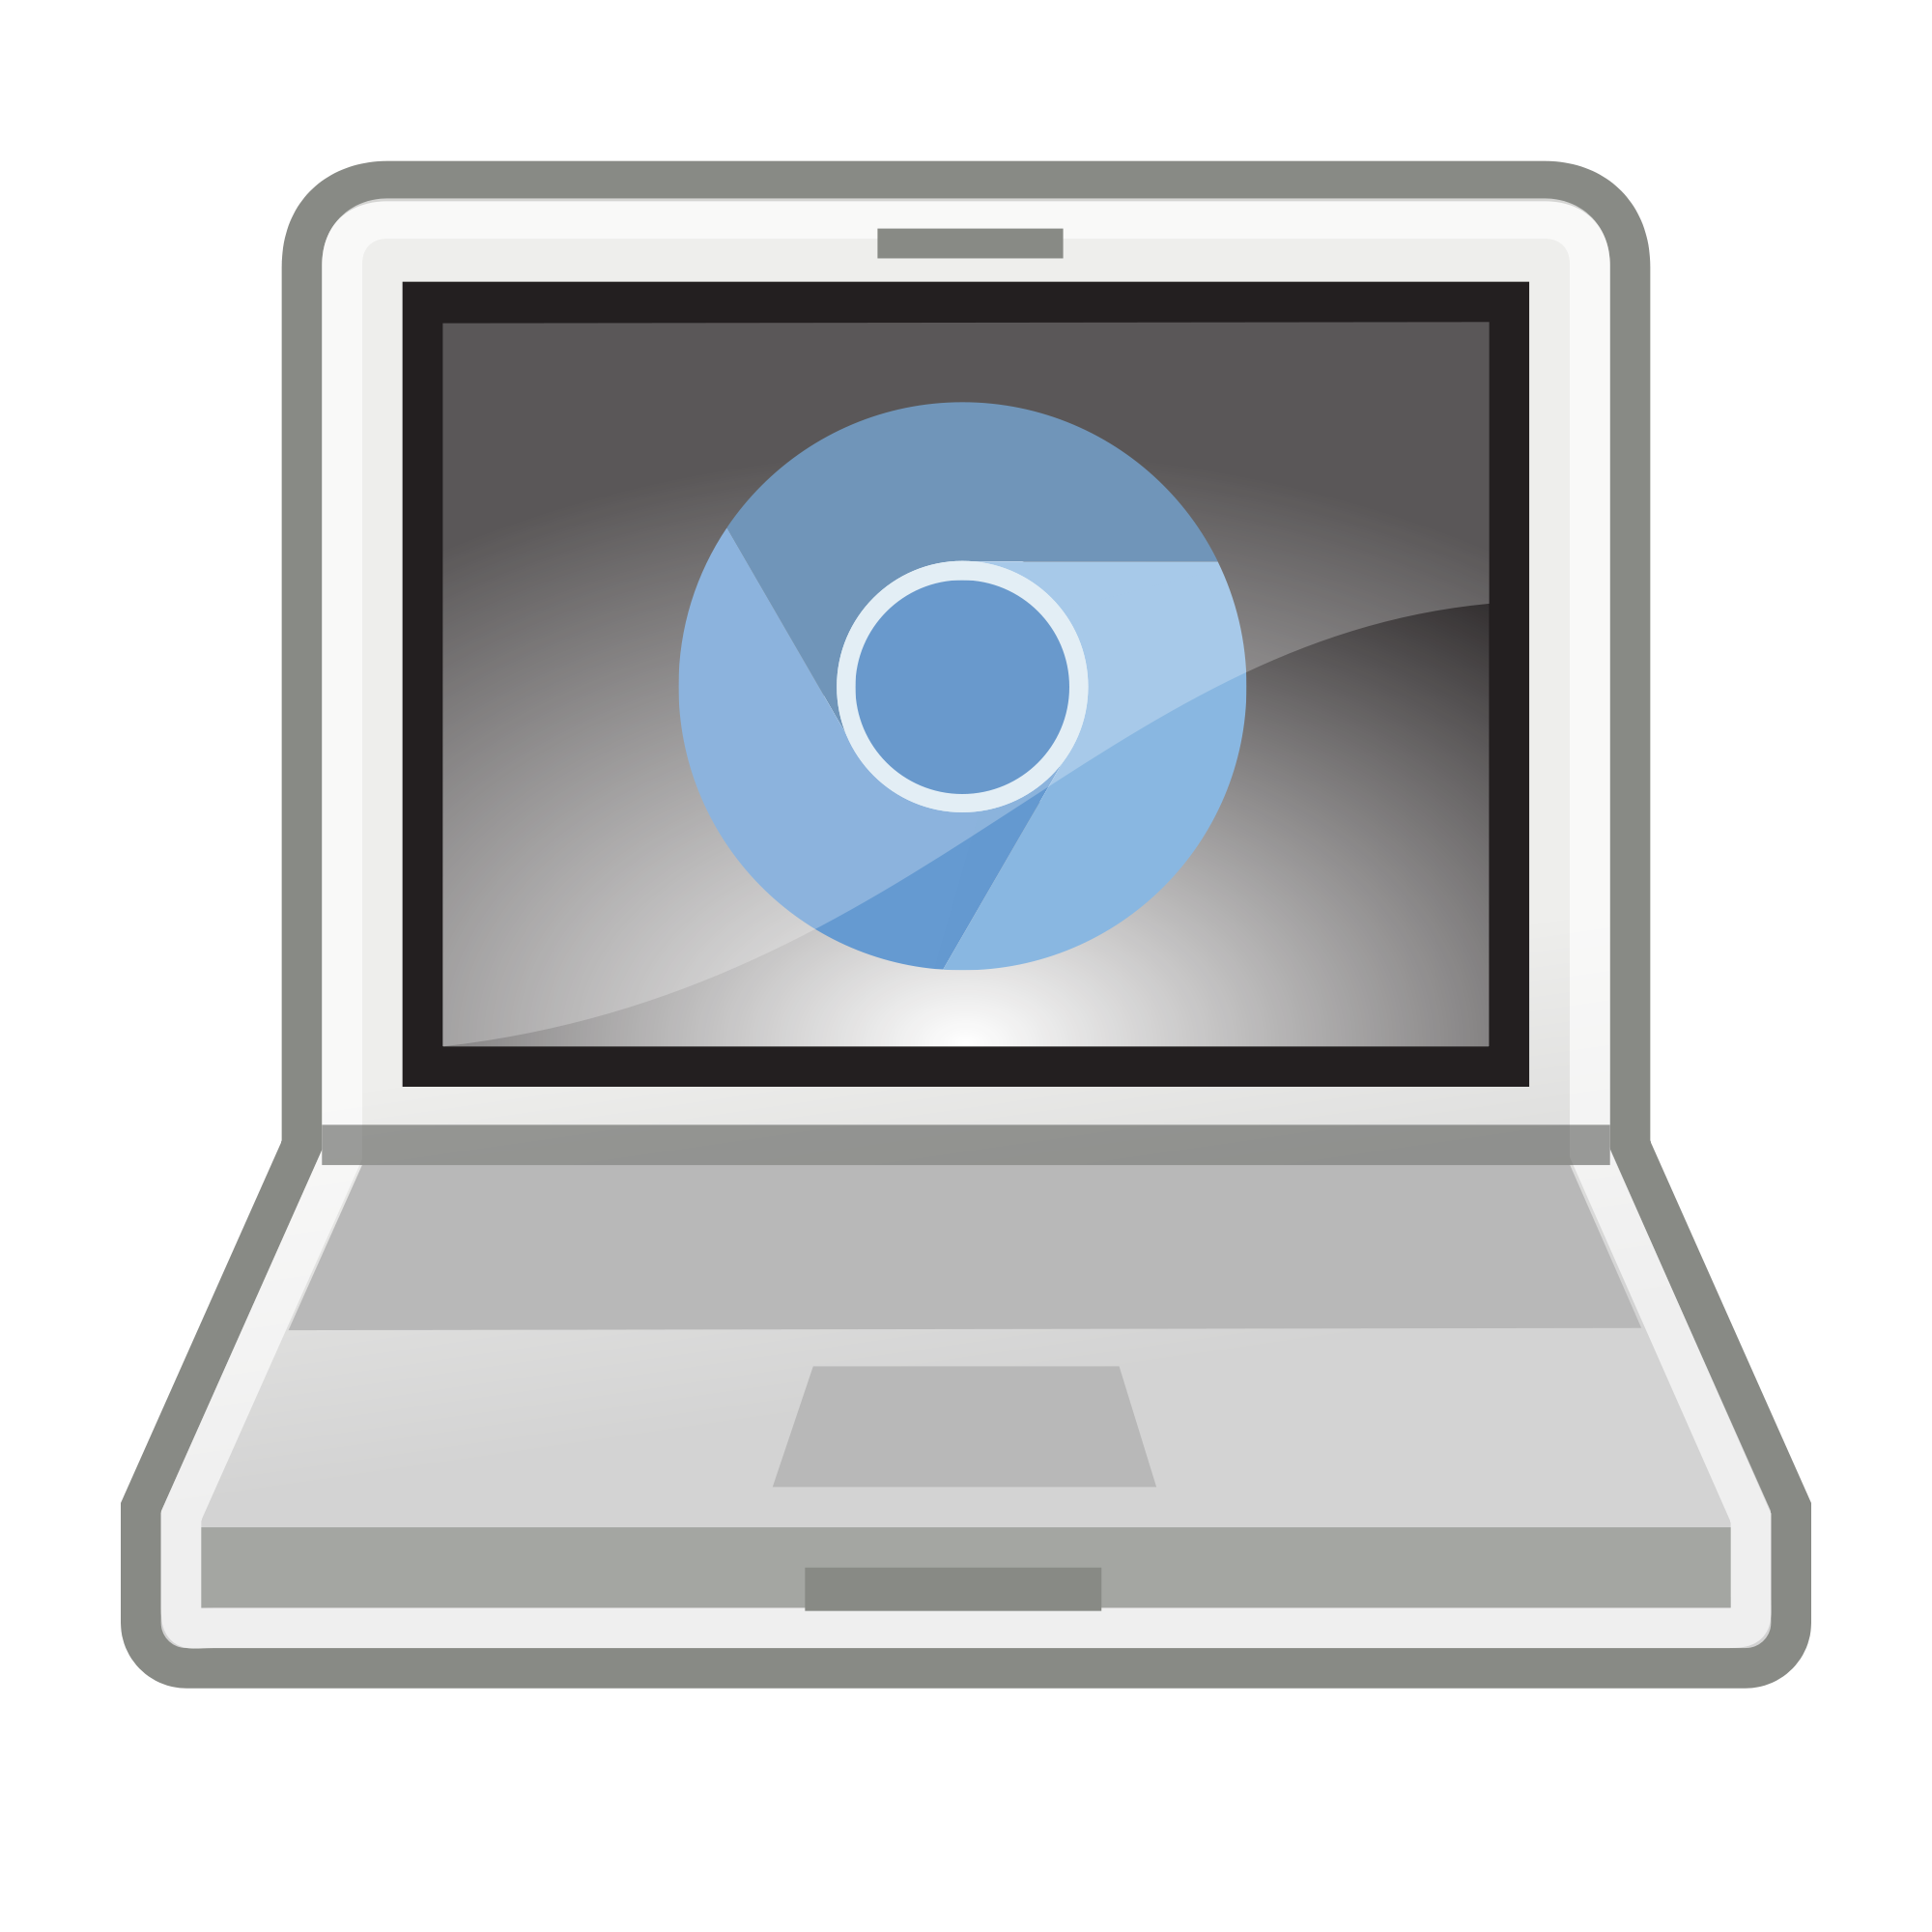 Website clipart chromebooks, Website chromebooks Transparent.